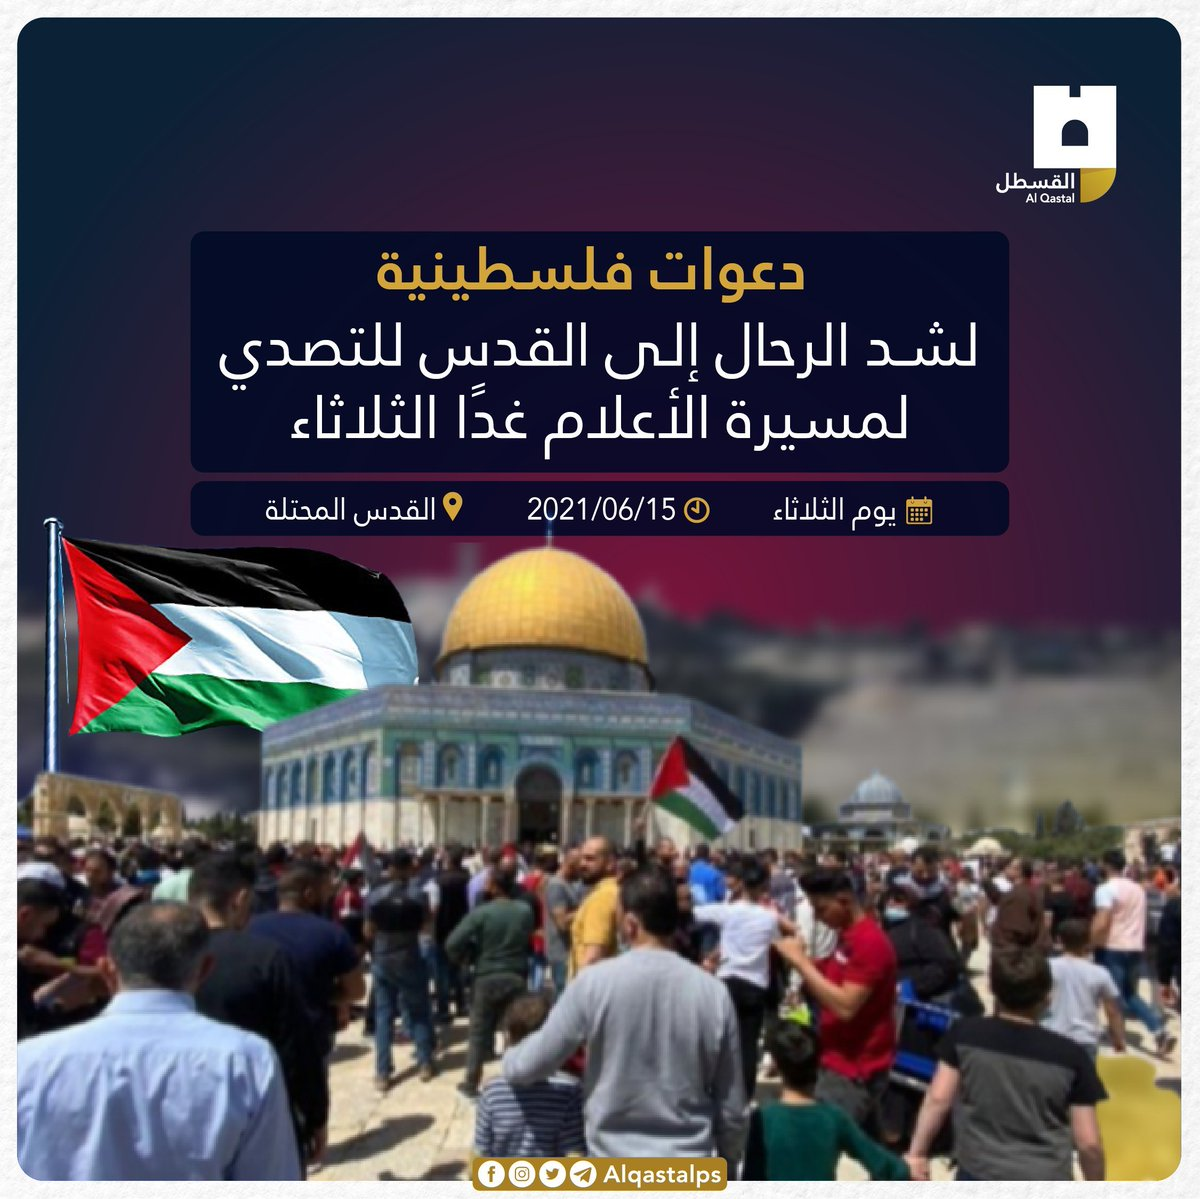 @fakhrifadzli's photo on #SavePalestine